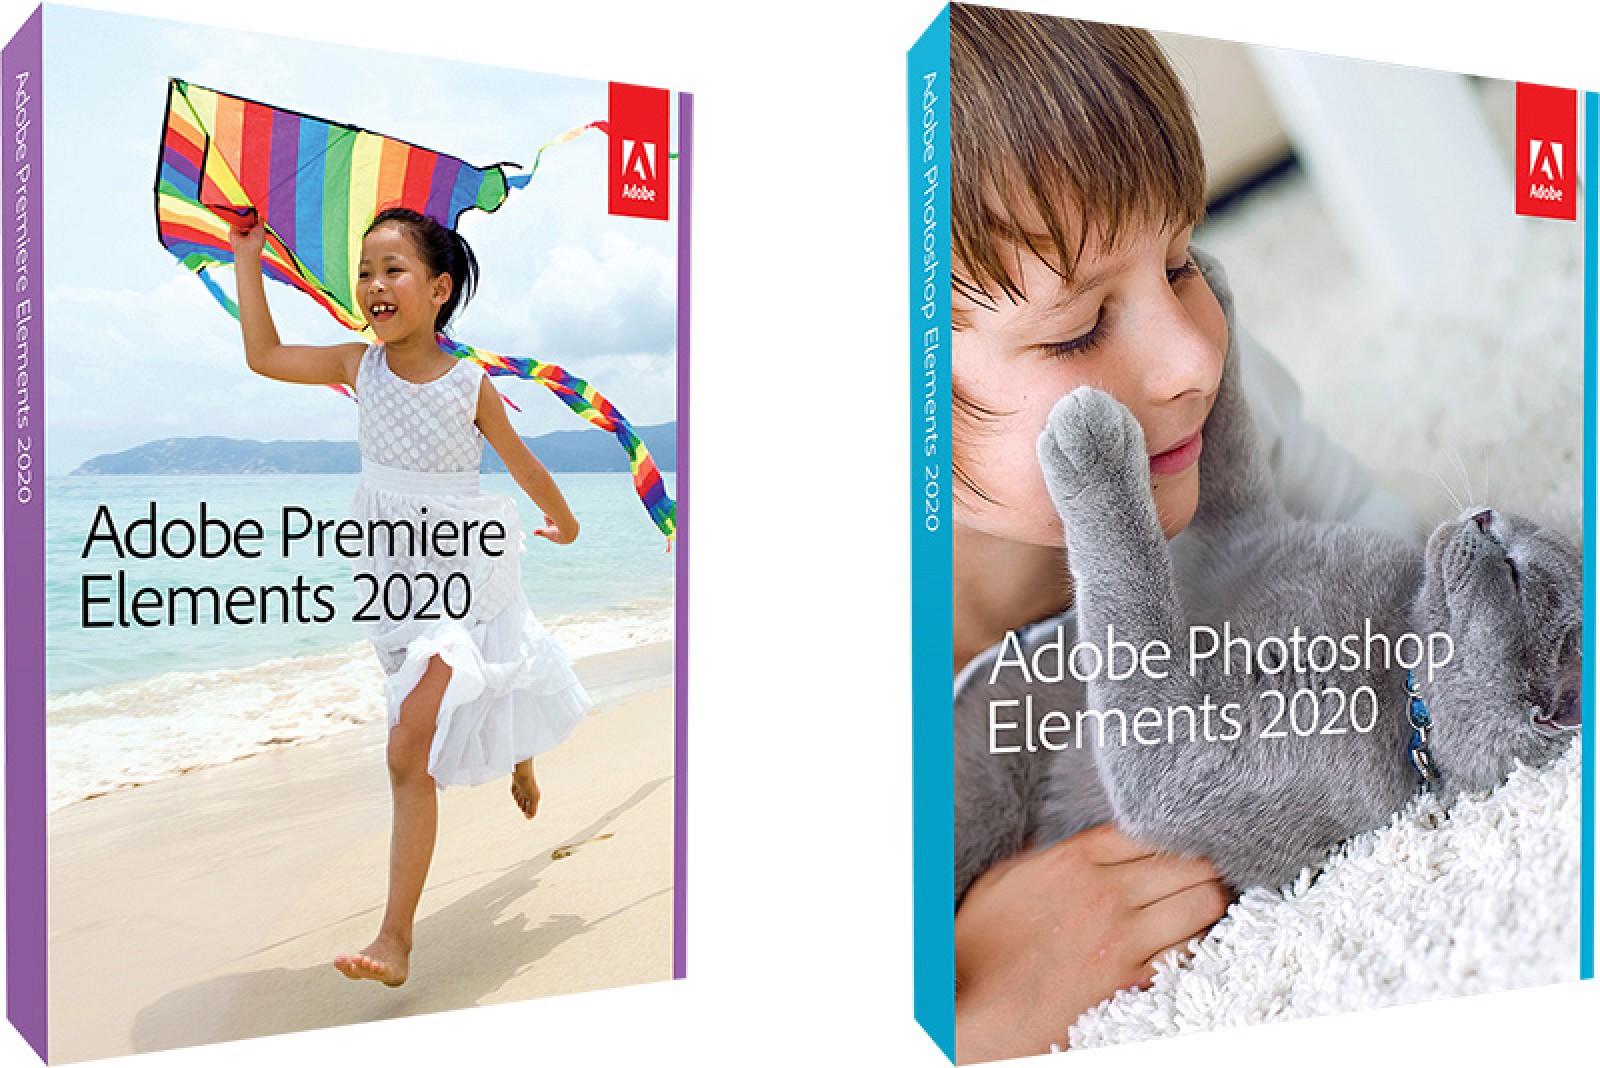 Adobe lanza Premiere y Photoshop Elements 2020